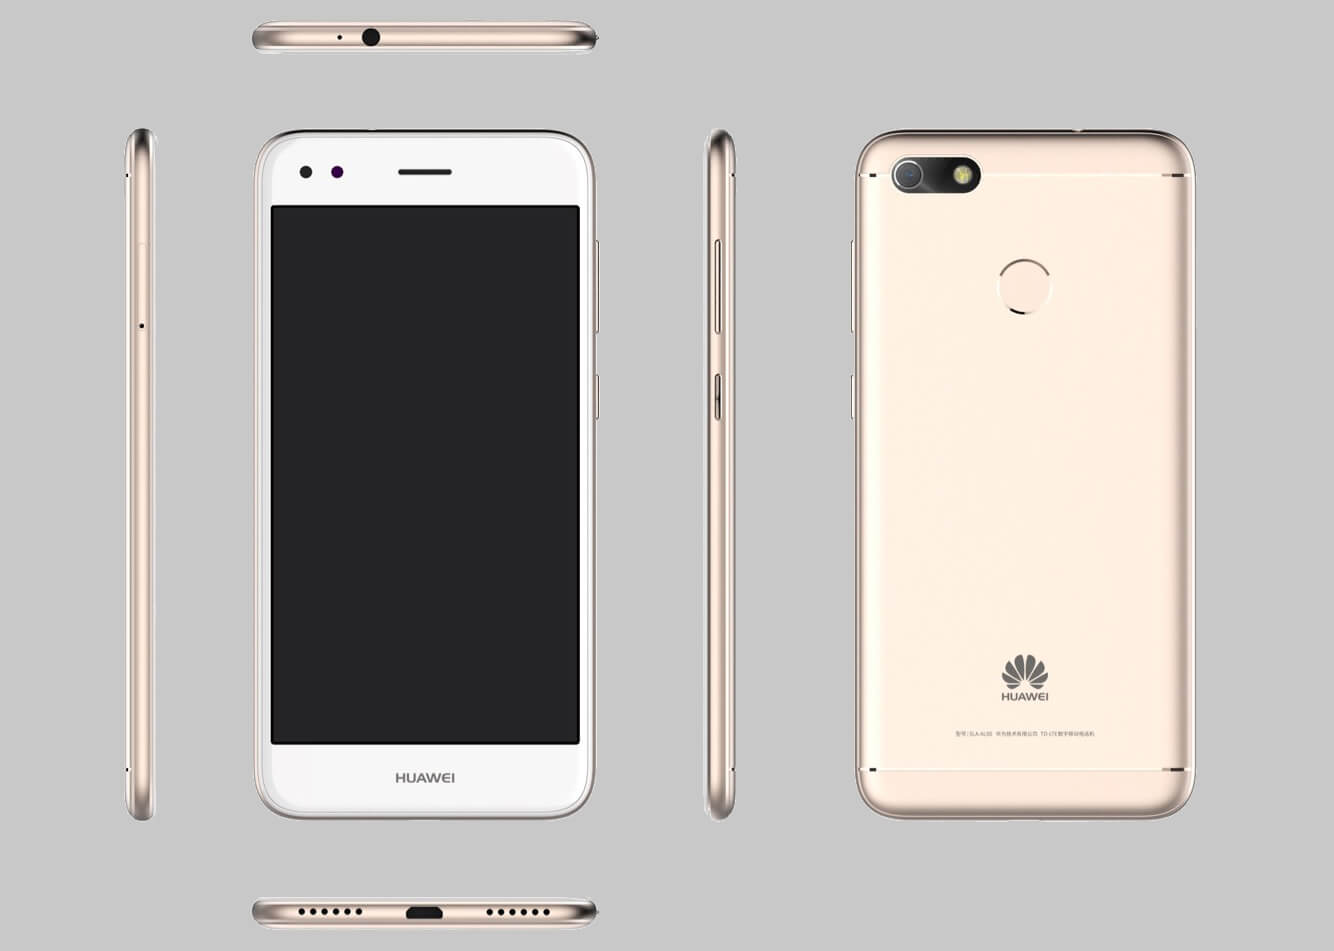 07e6708a29559 el Huawei P9 lite mini tiene una pantalla de 5